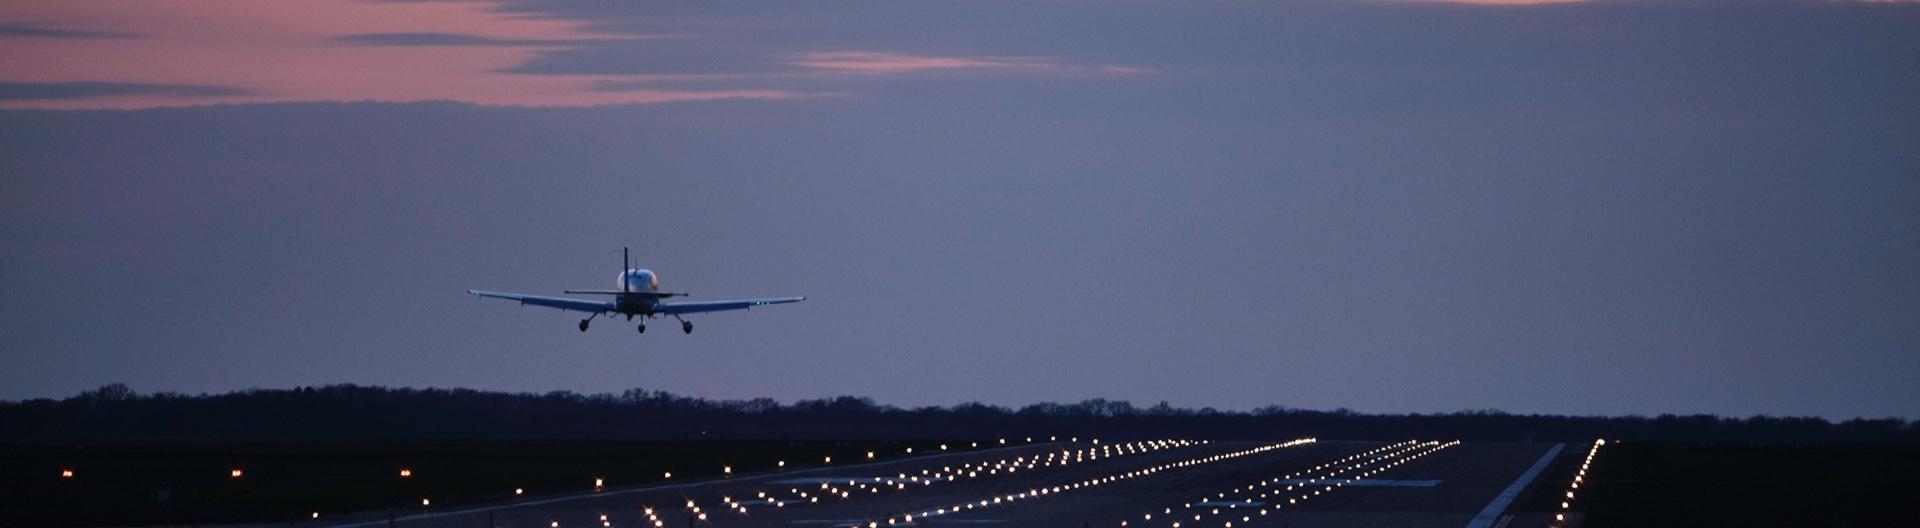 Flugzeug landet im Sonnenuntergang am Hannover Airport, Hannover-Langehagen, 16.03.2020